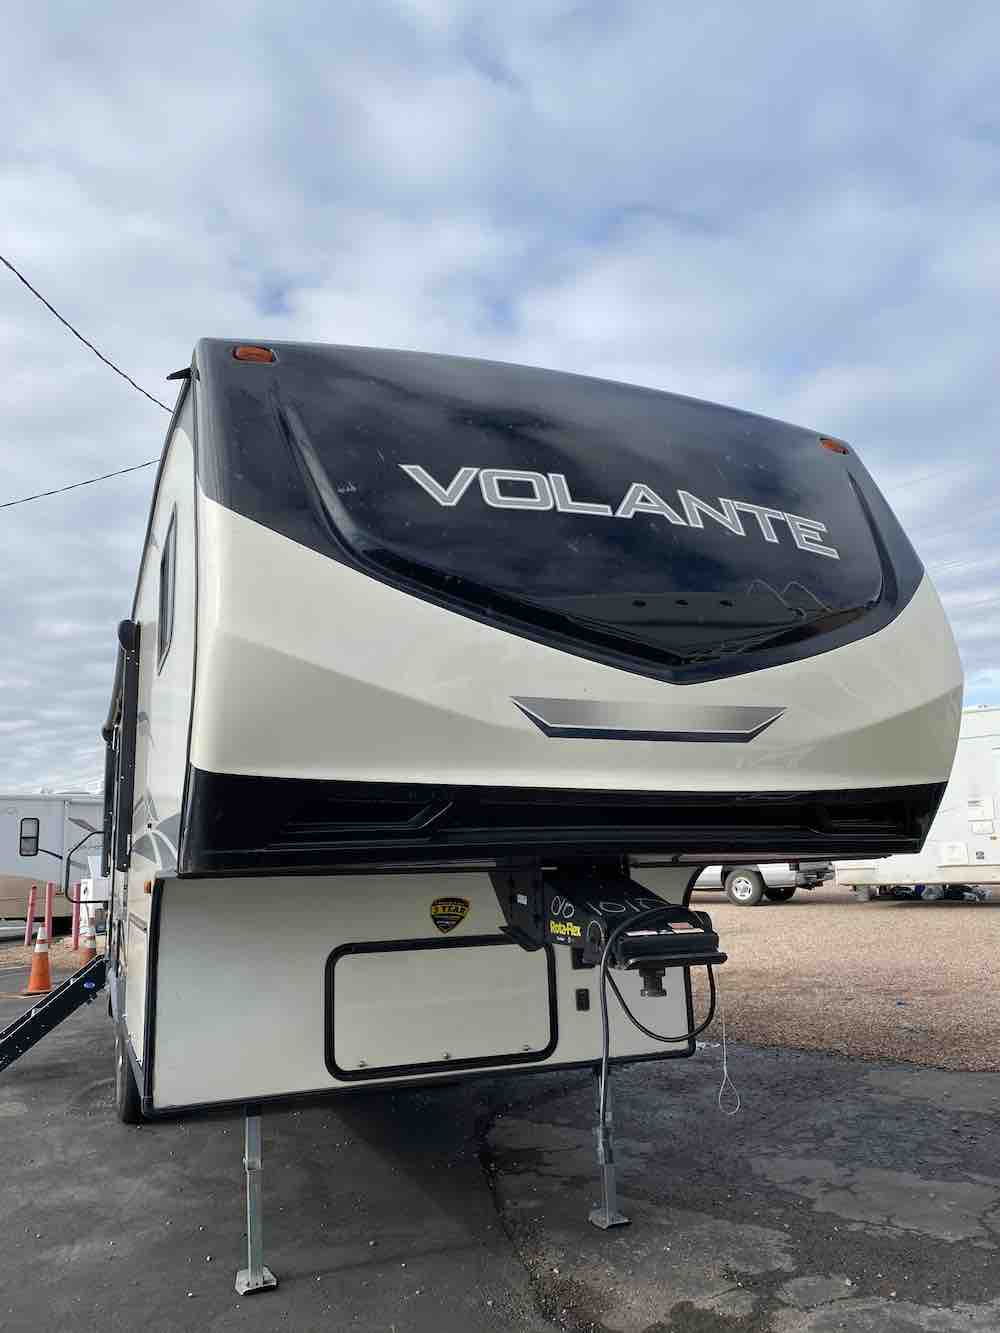 2019 KEYSTONE CROSSROADS VOLANTE VL240RL full